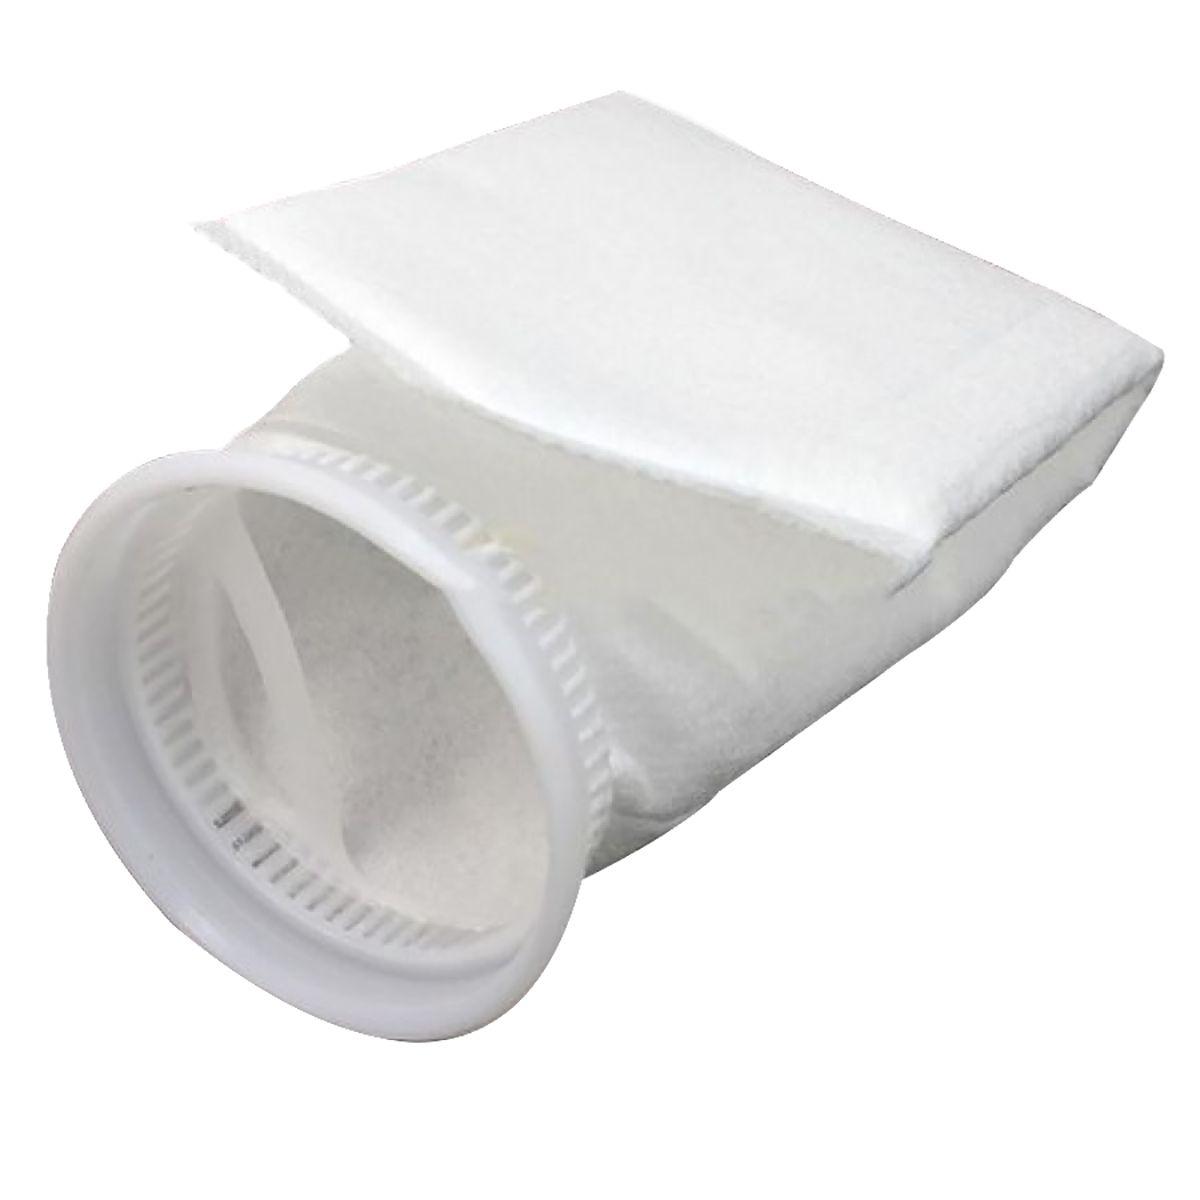 SOMA SHARK BAG 200 Micras - Aro Plástico (18 x 30cm) ECONOMY